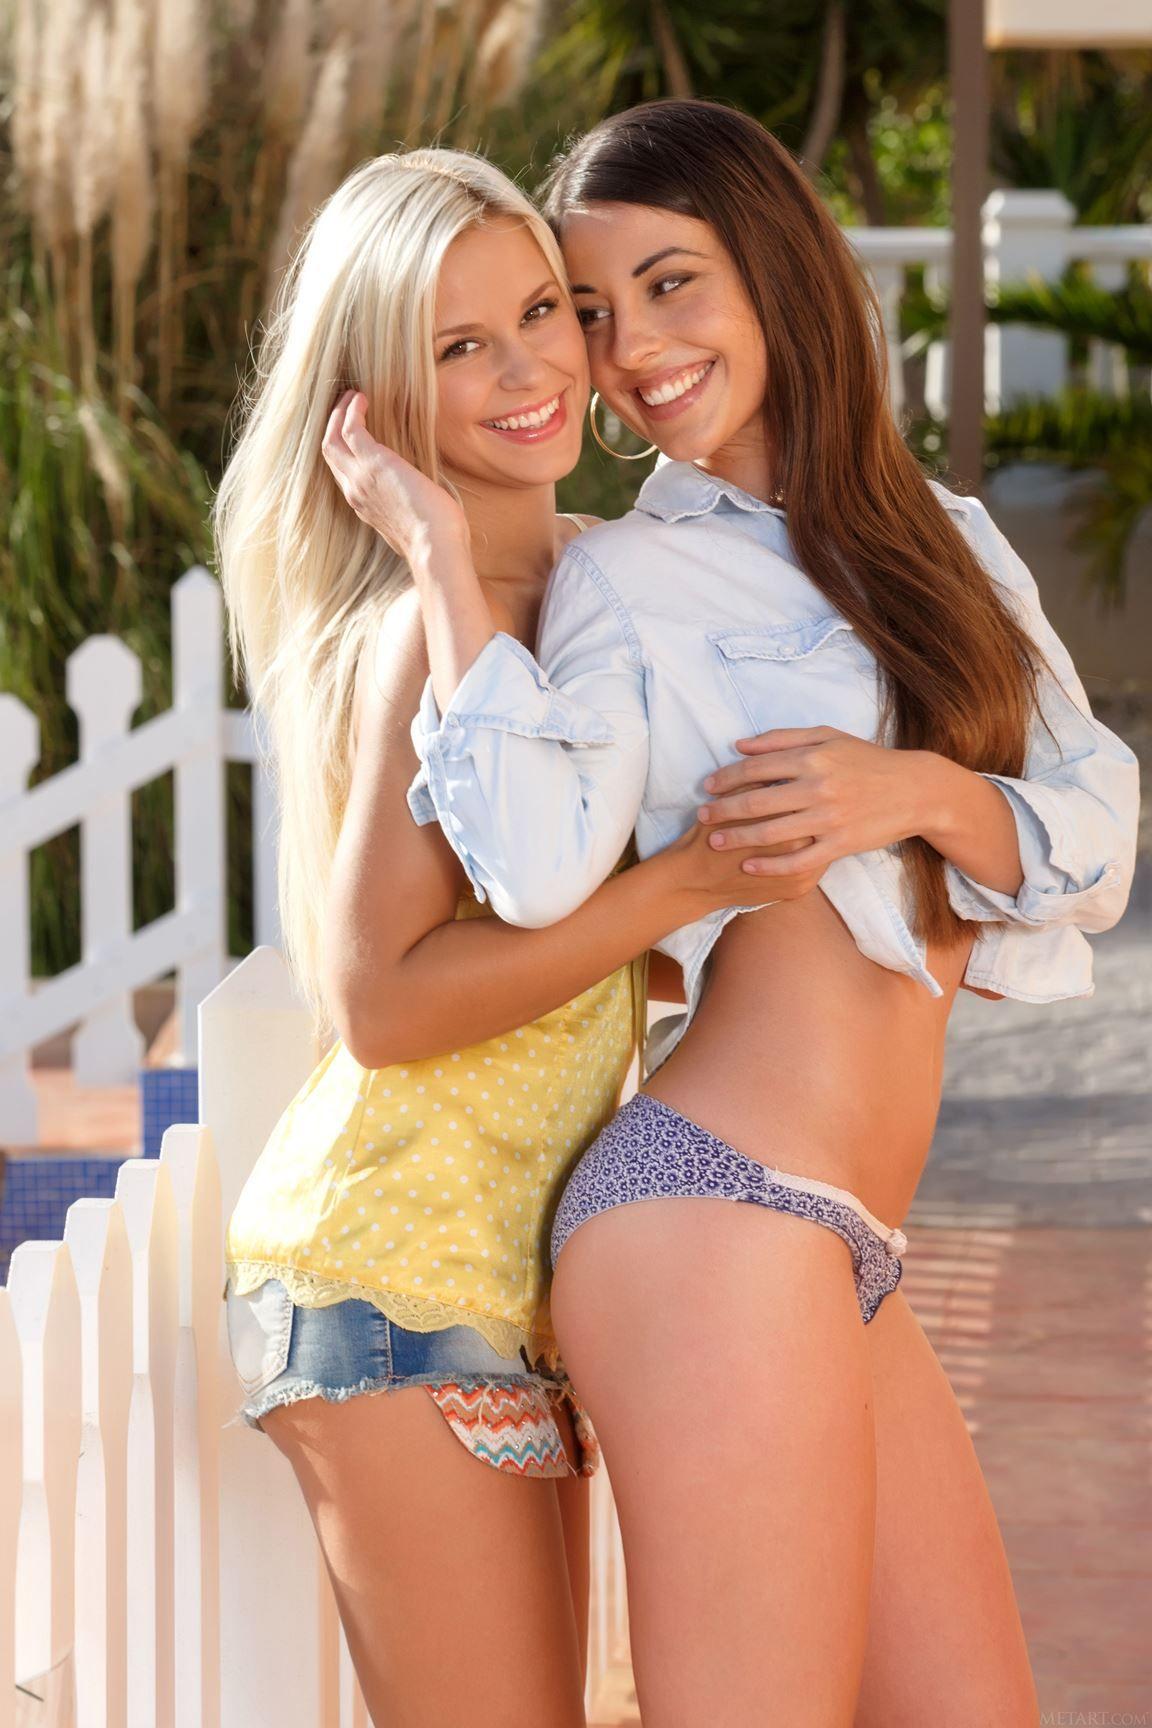 Happiness Girls In Love Cute Girls Teen Babes Lesbian Love Girlfriends